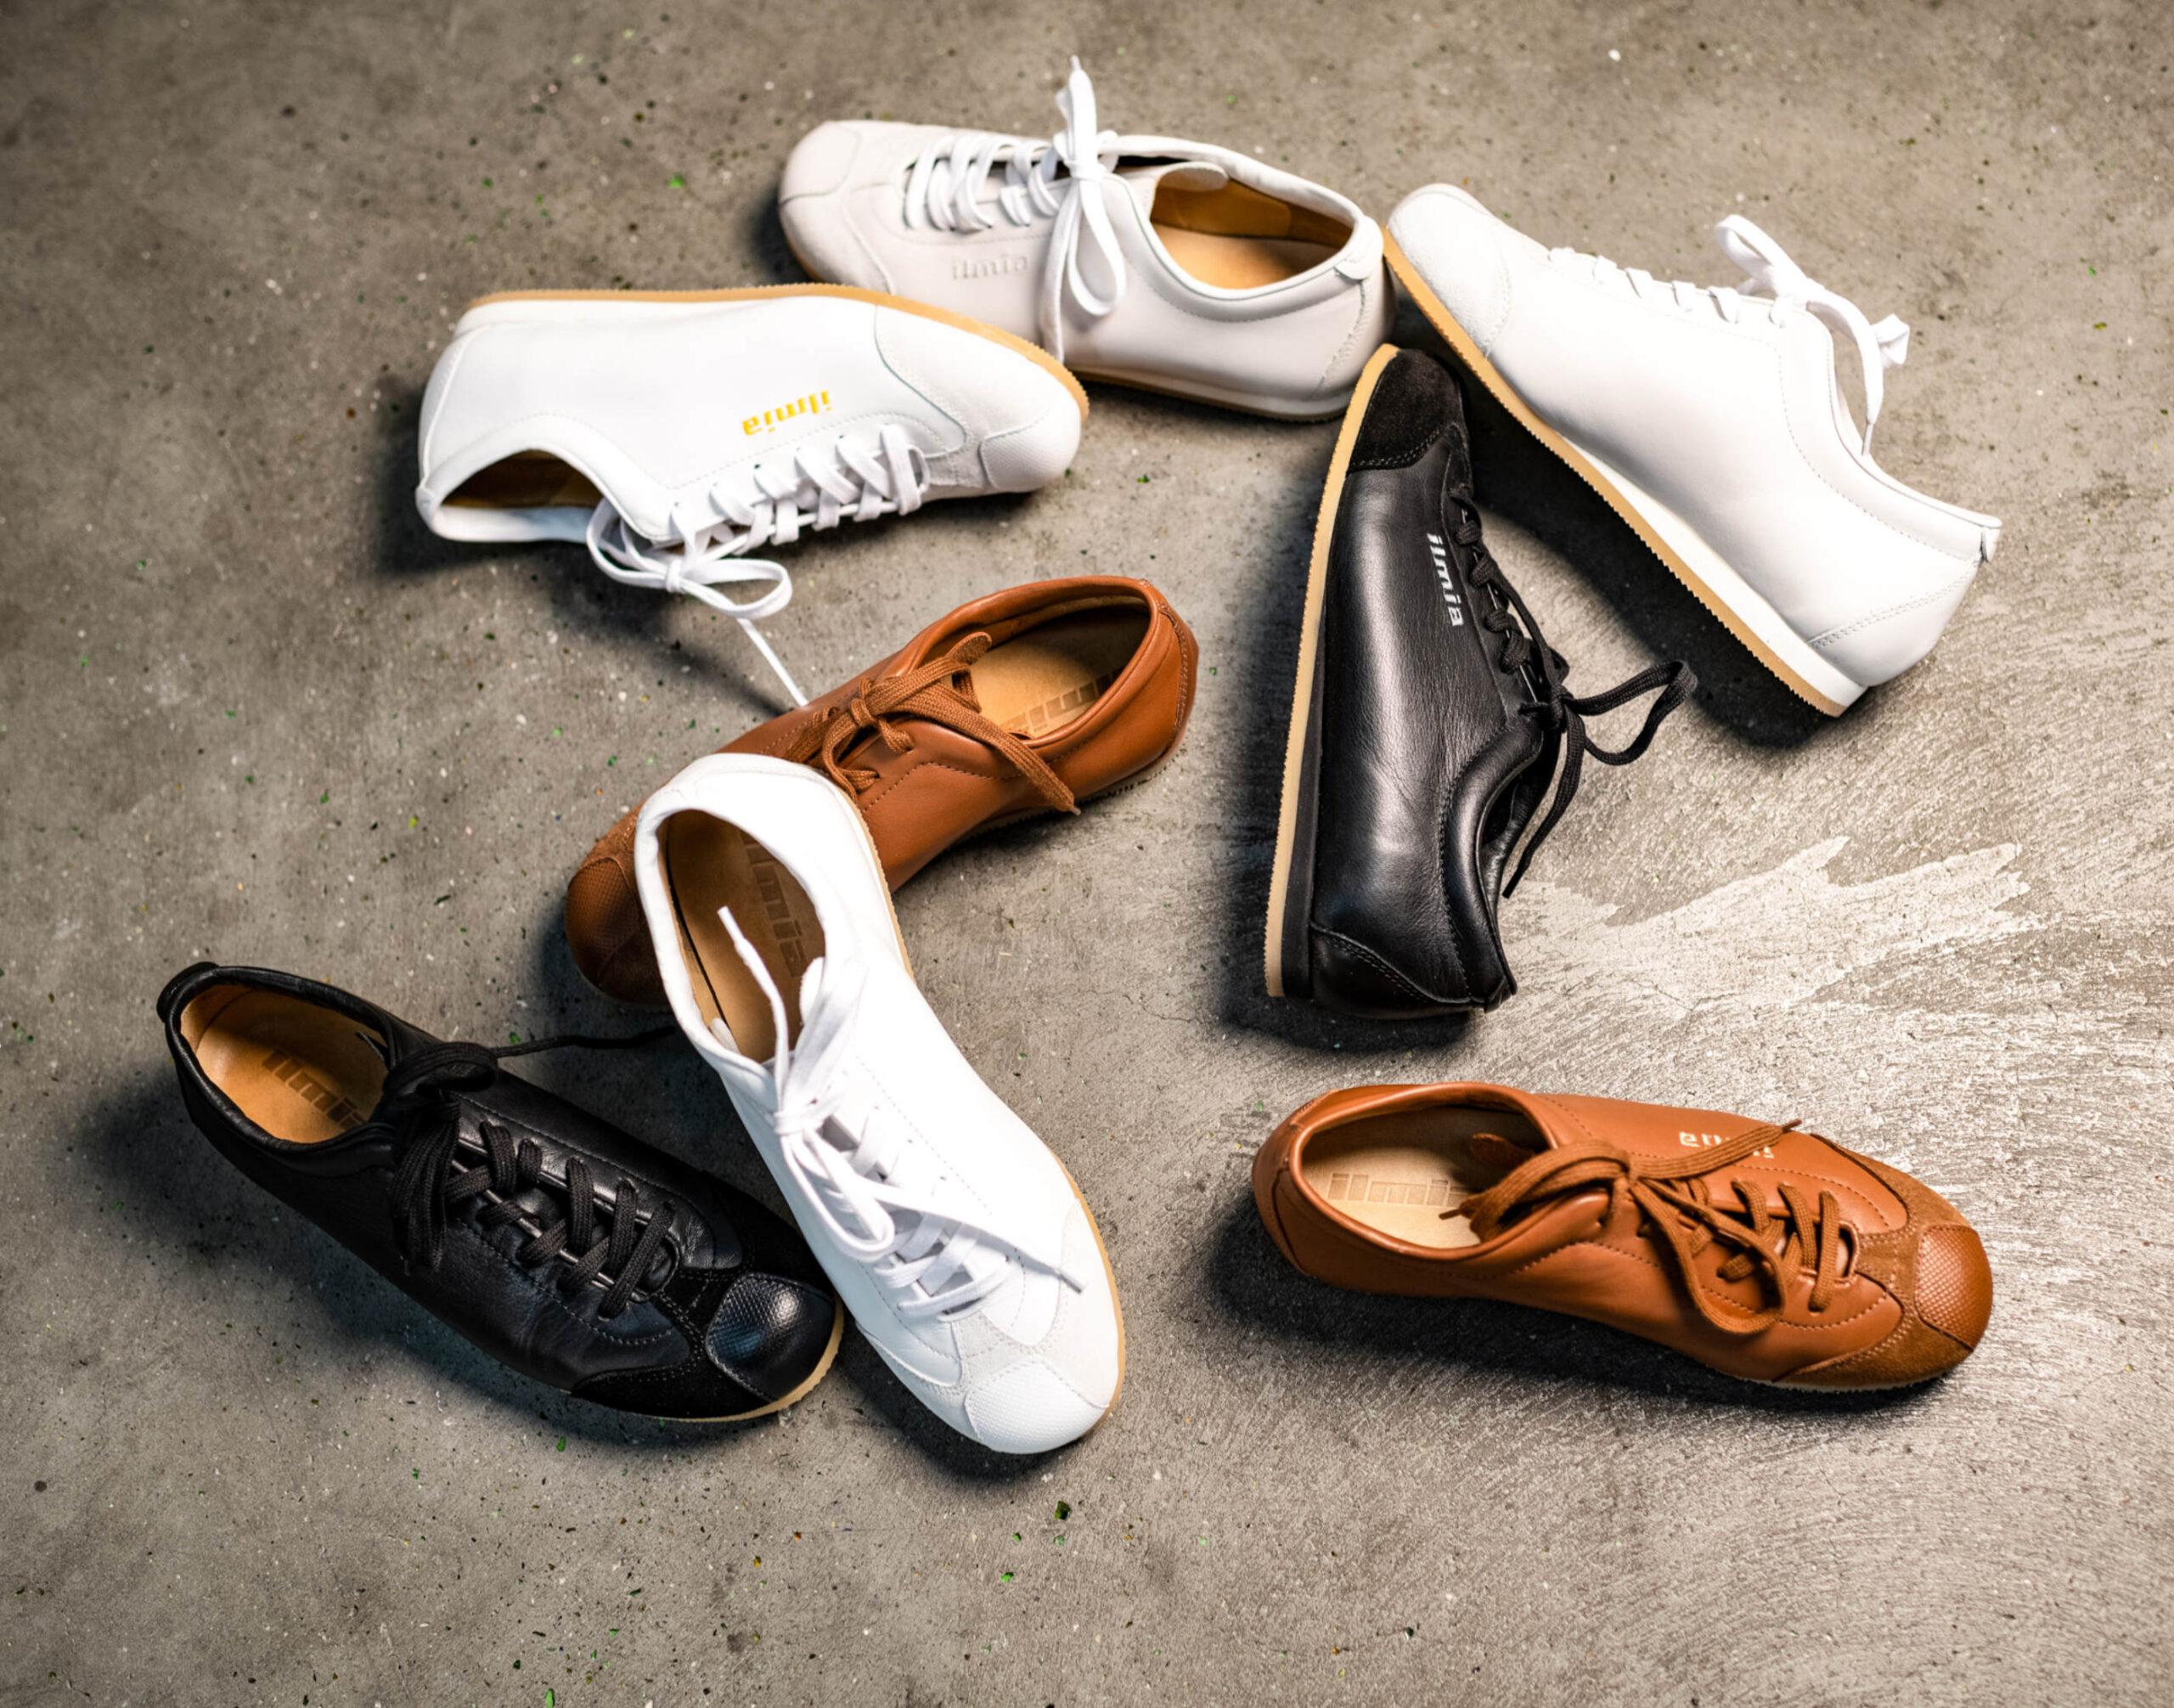 ilmia shoes